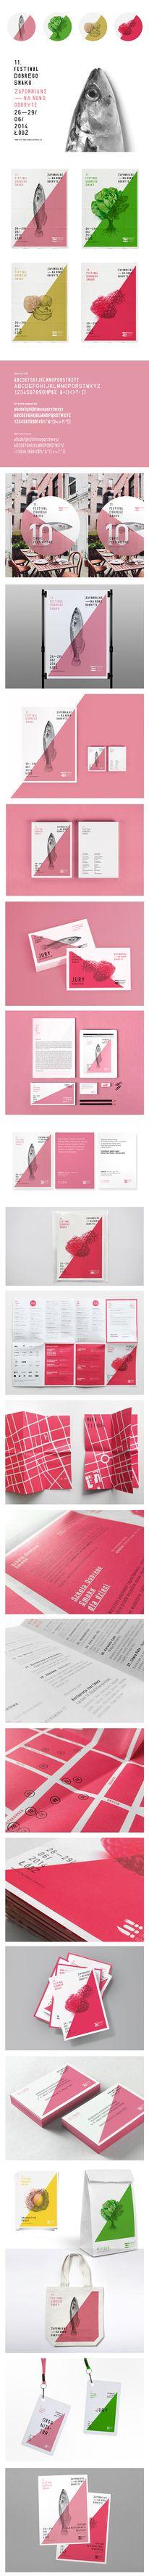 identity of the 11. Festival Dobrego Smaku in Lodz on Branding Served — Designspiration